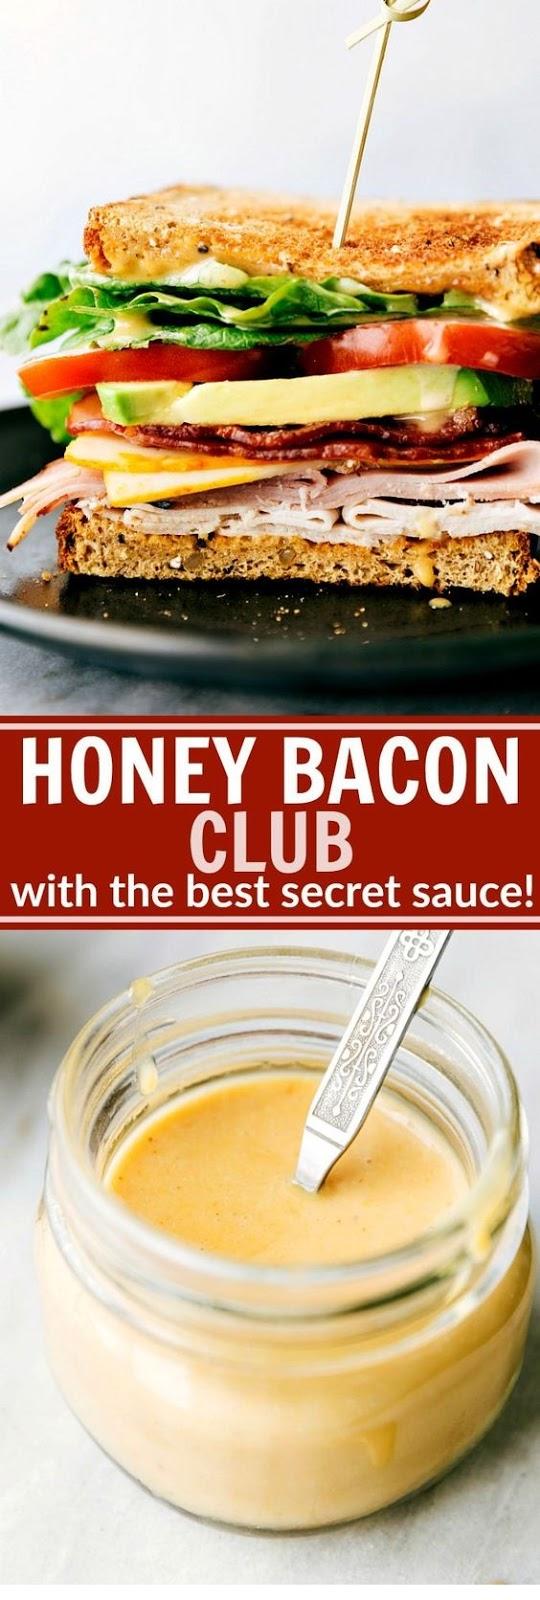 Honey Bacon Club